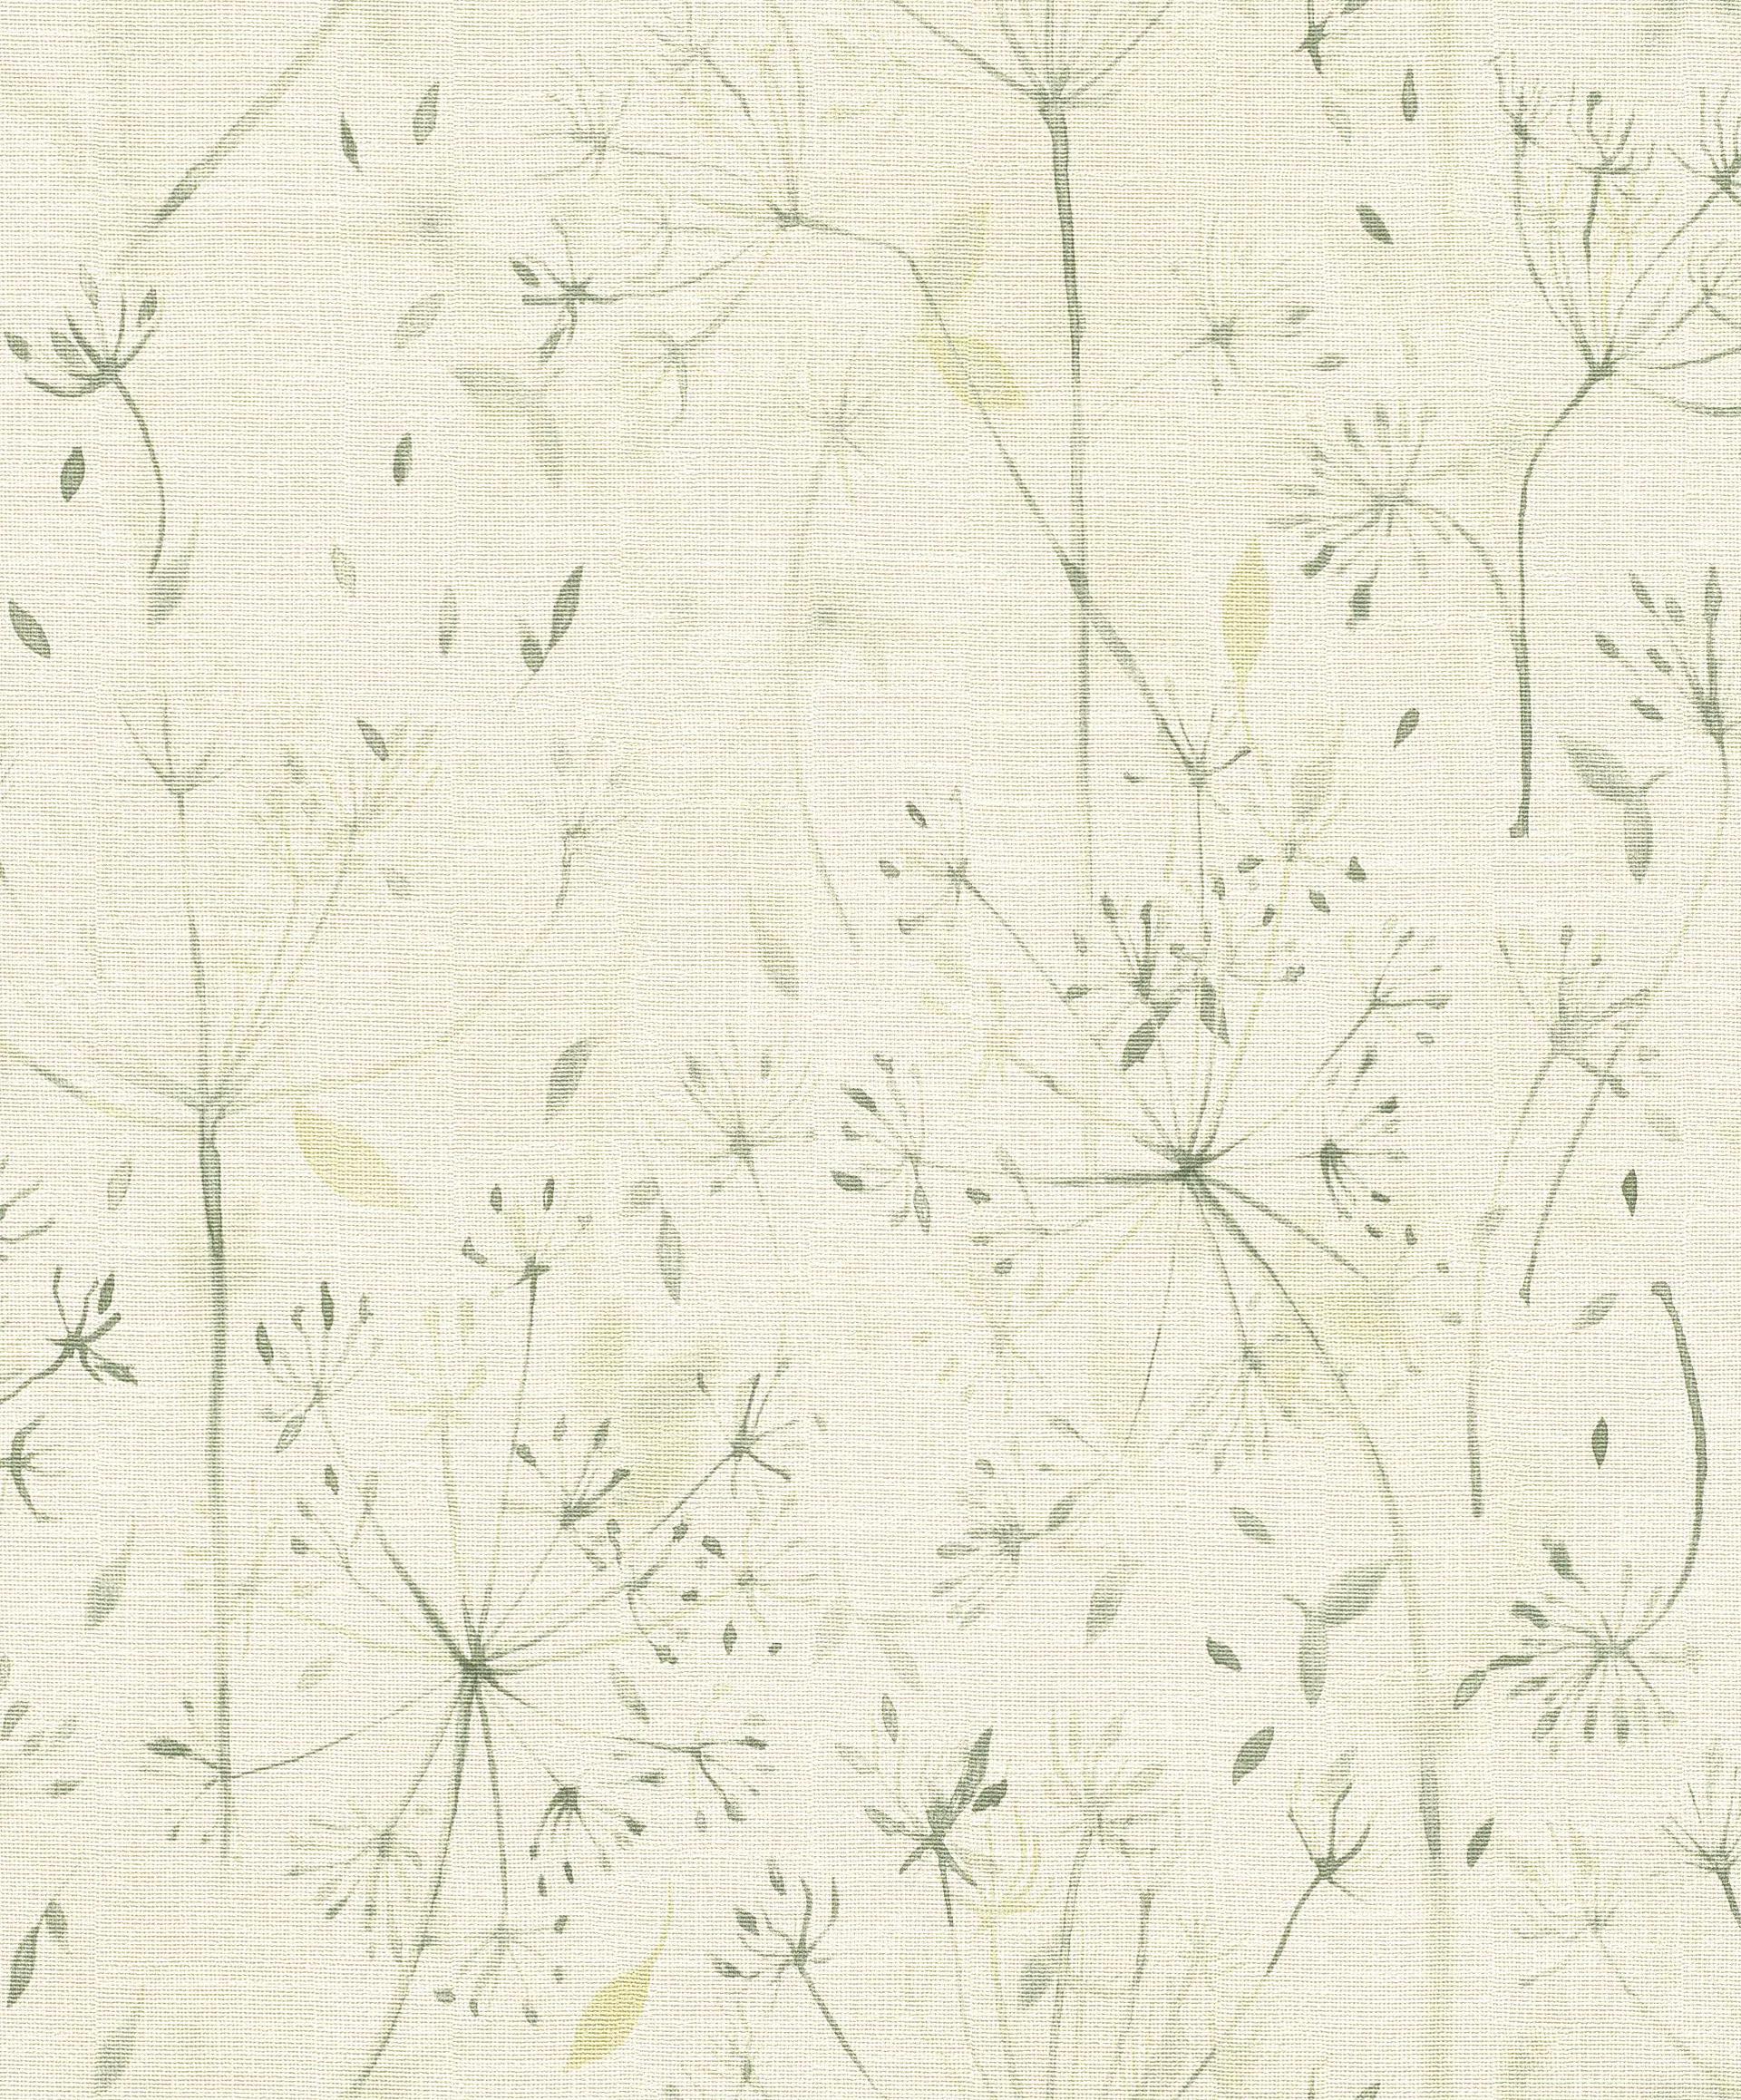 Pitypang virág mintás tapéta bézs, zöld színekkel